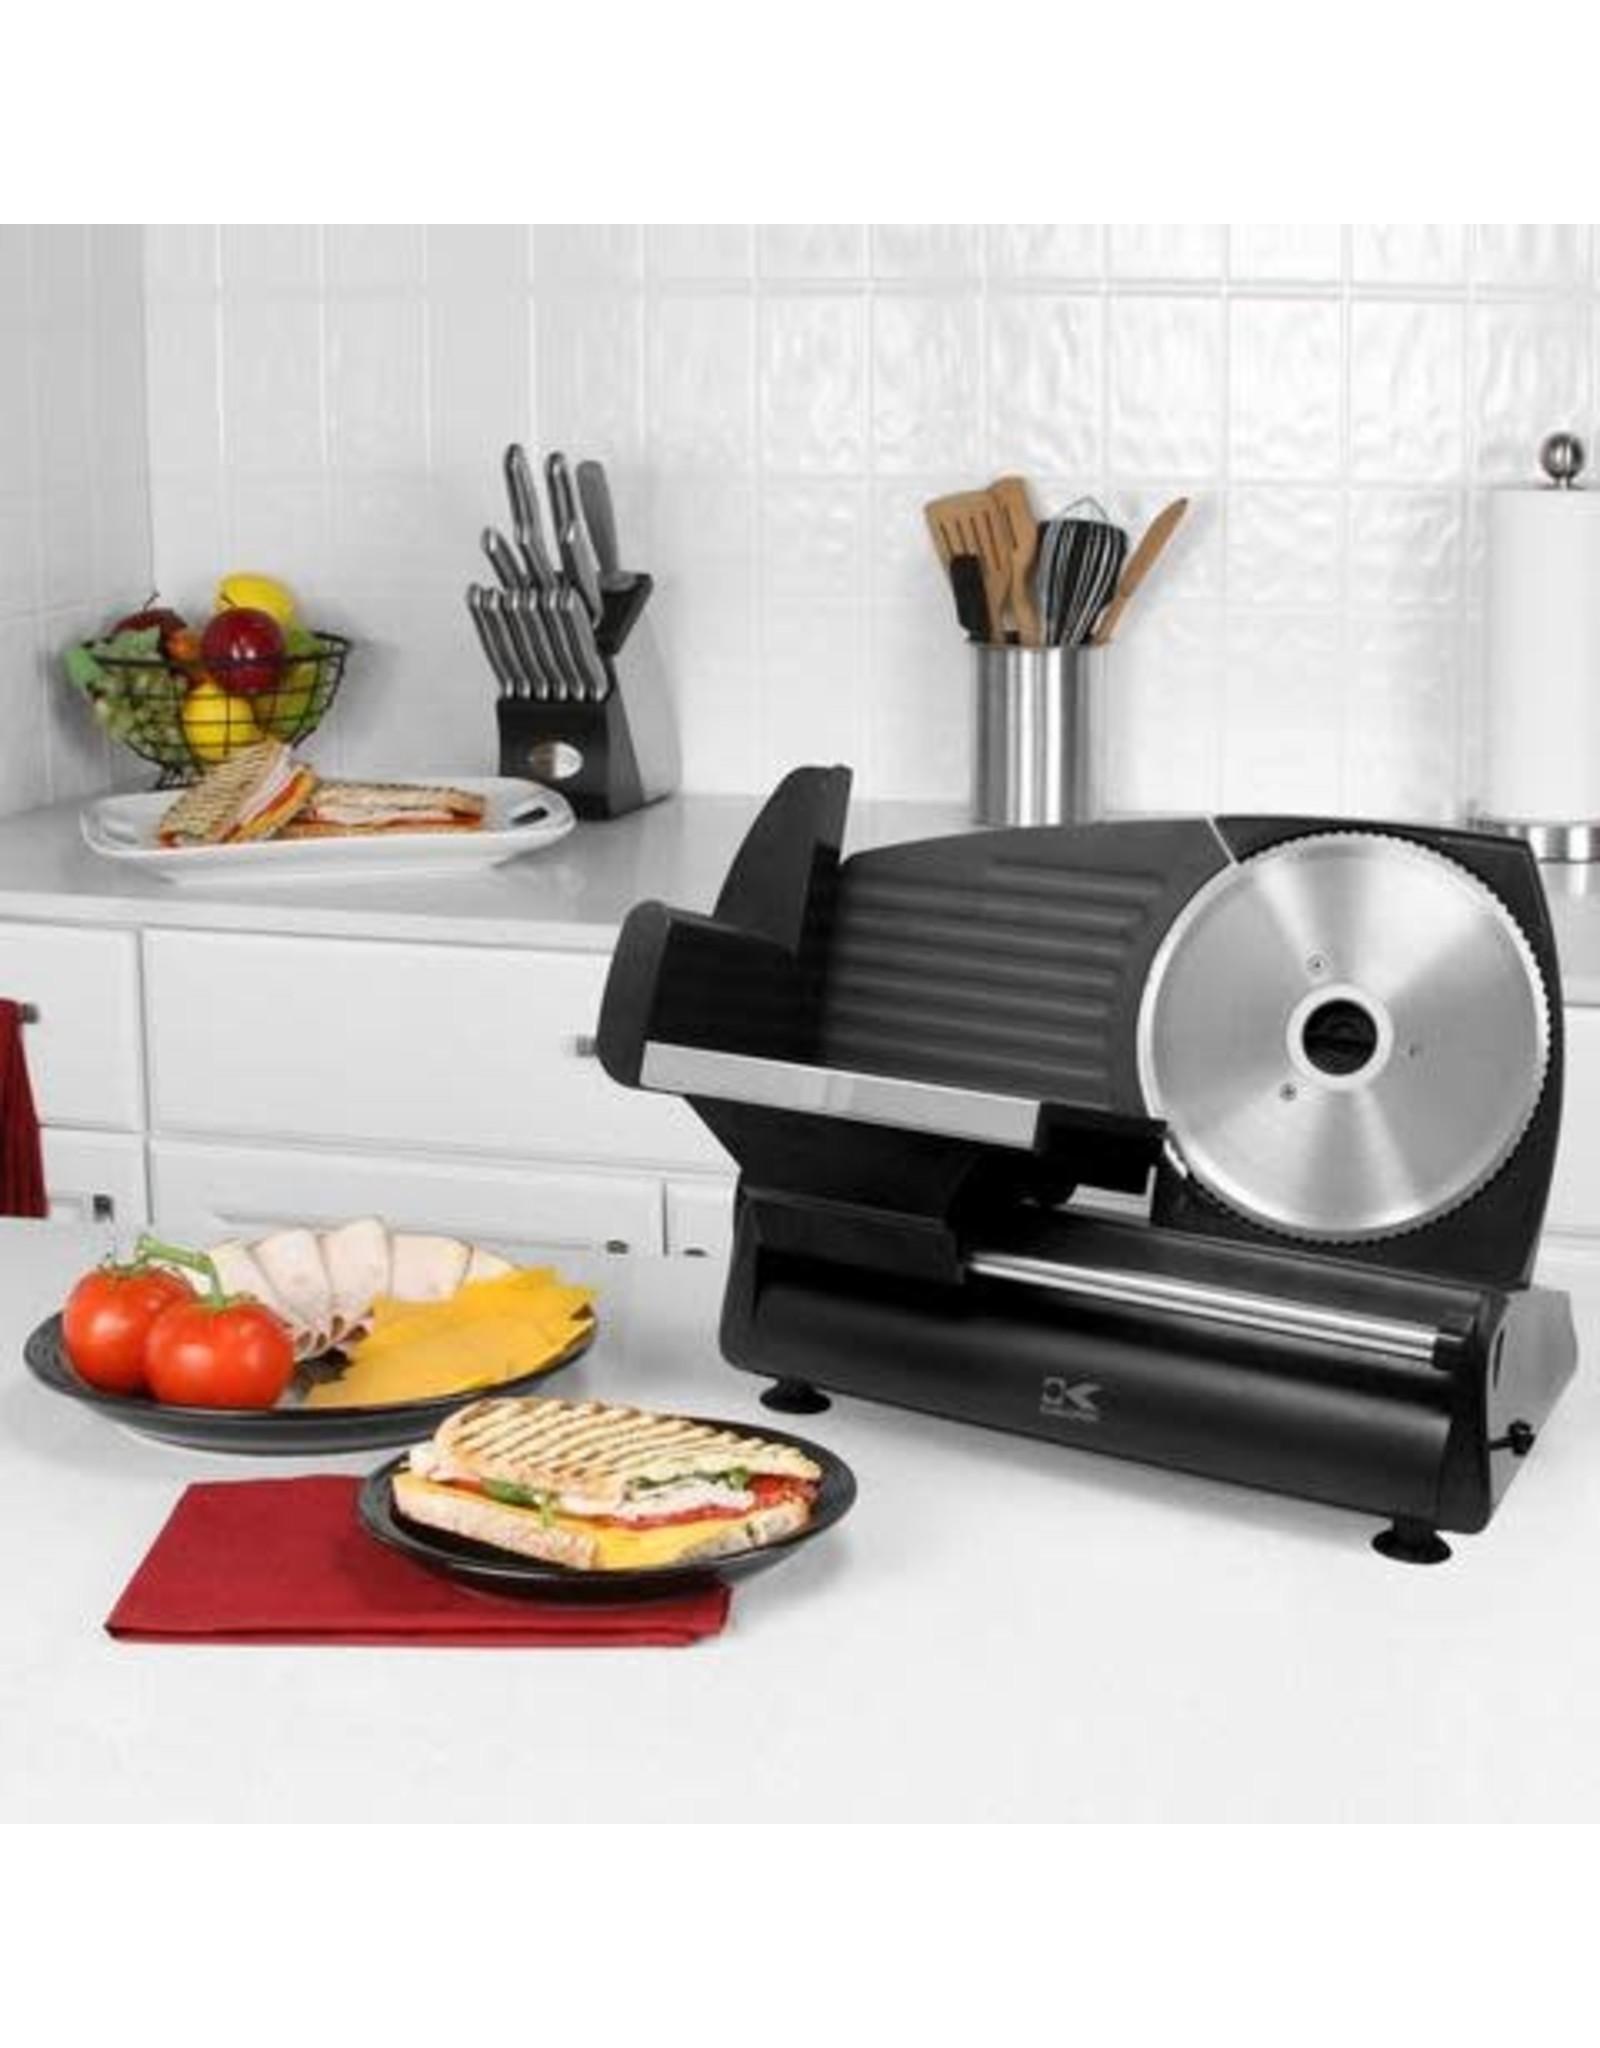 KALORIK AS 40763 BK Kalorik - 180 Watts Professional Style Food Slicer - Black